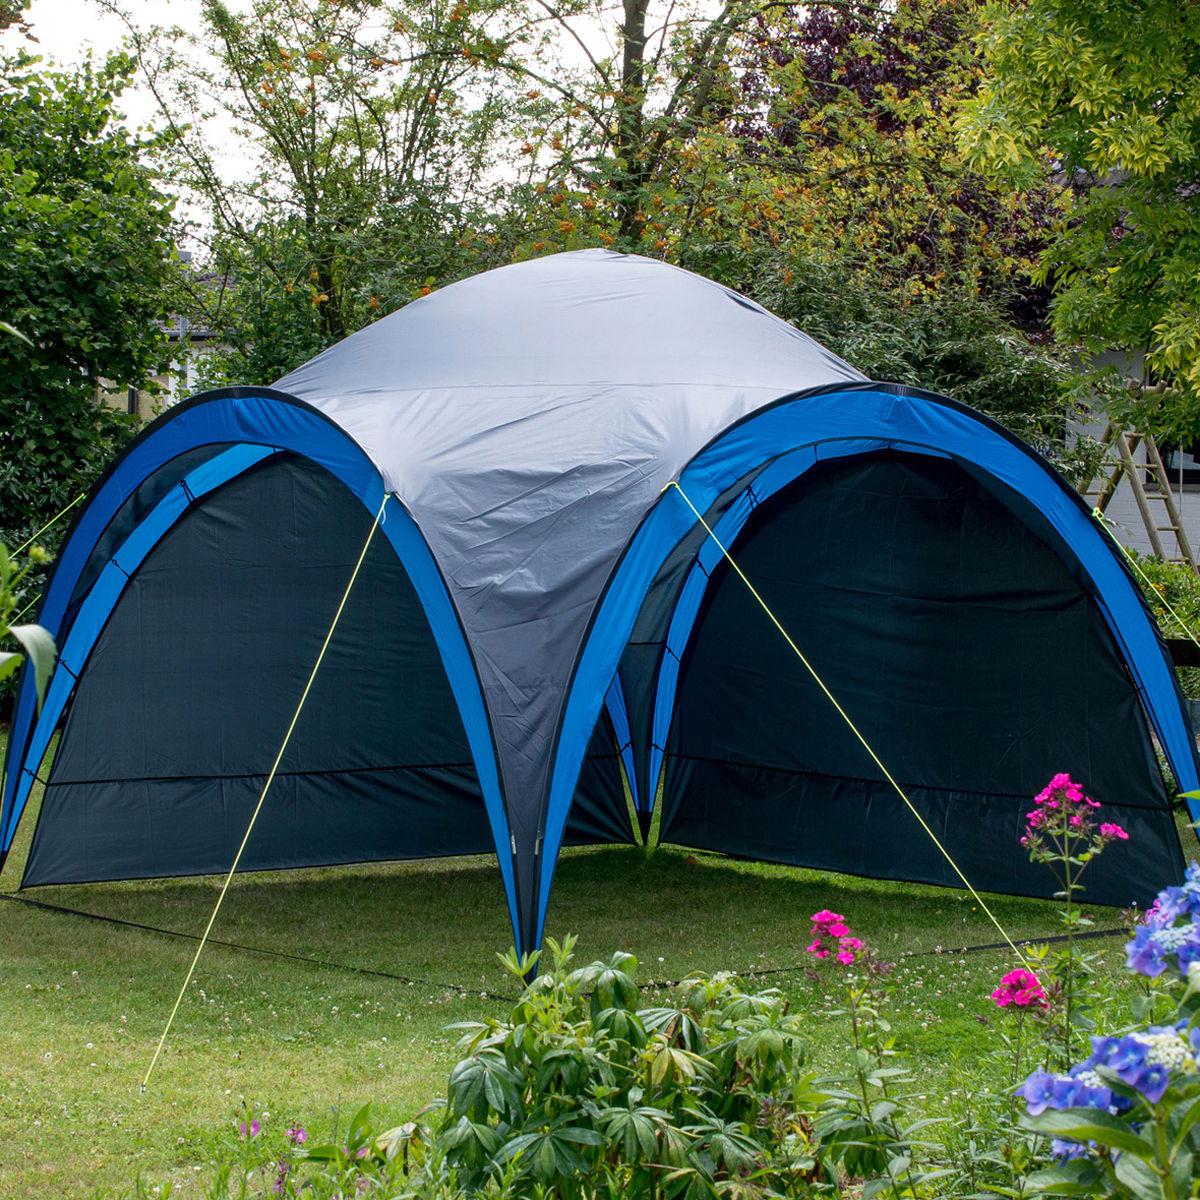 Pavillon Zelt Hagebau : Pavillon zelt garten partyzelt party sonnenschutz camping